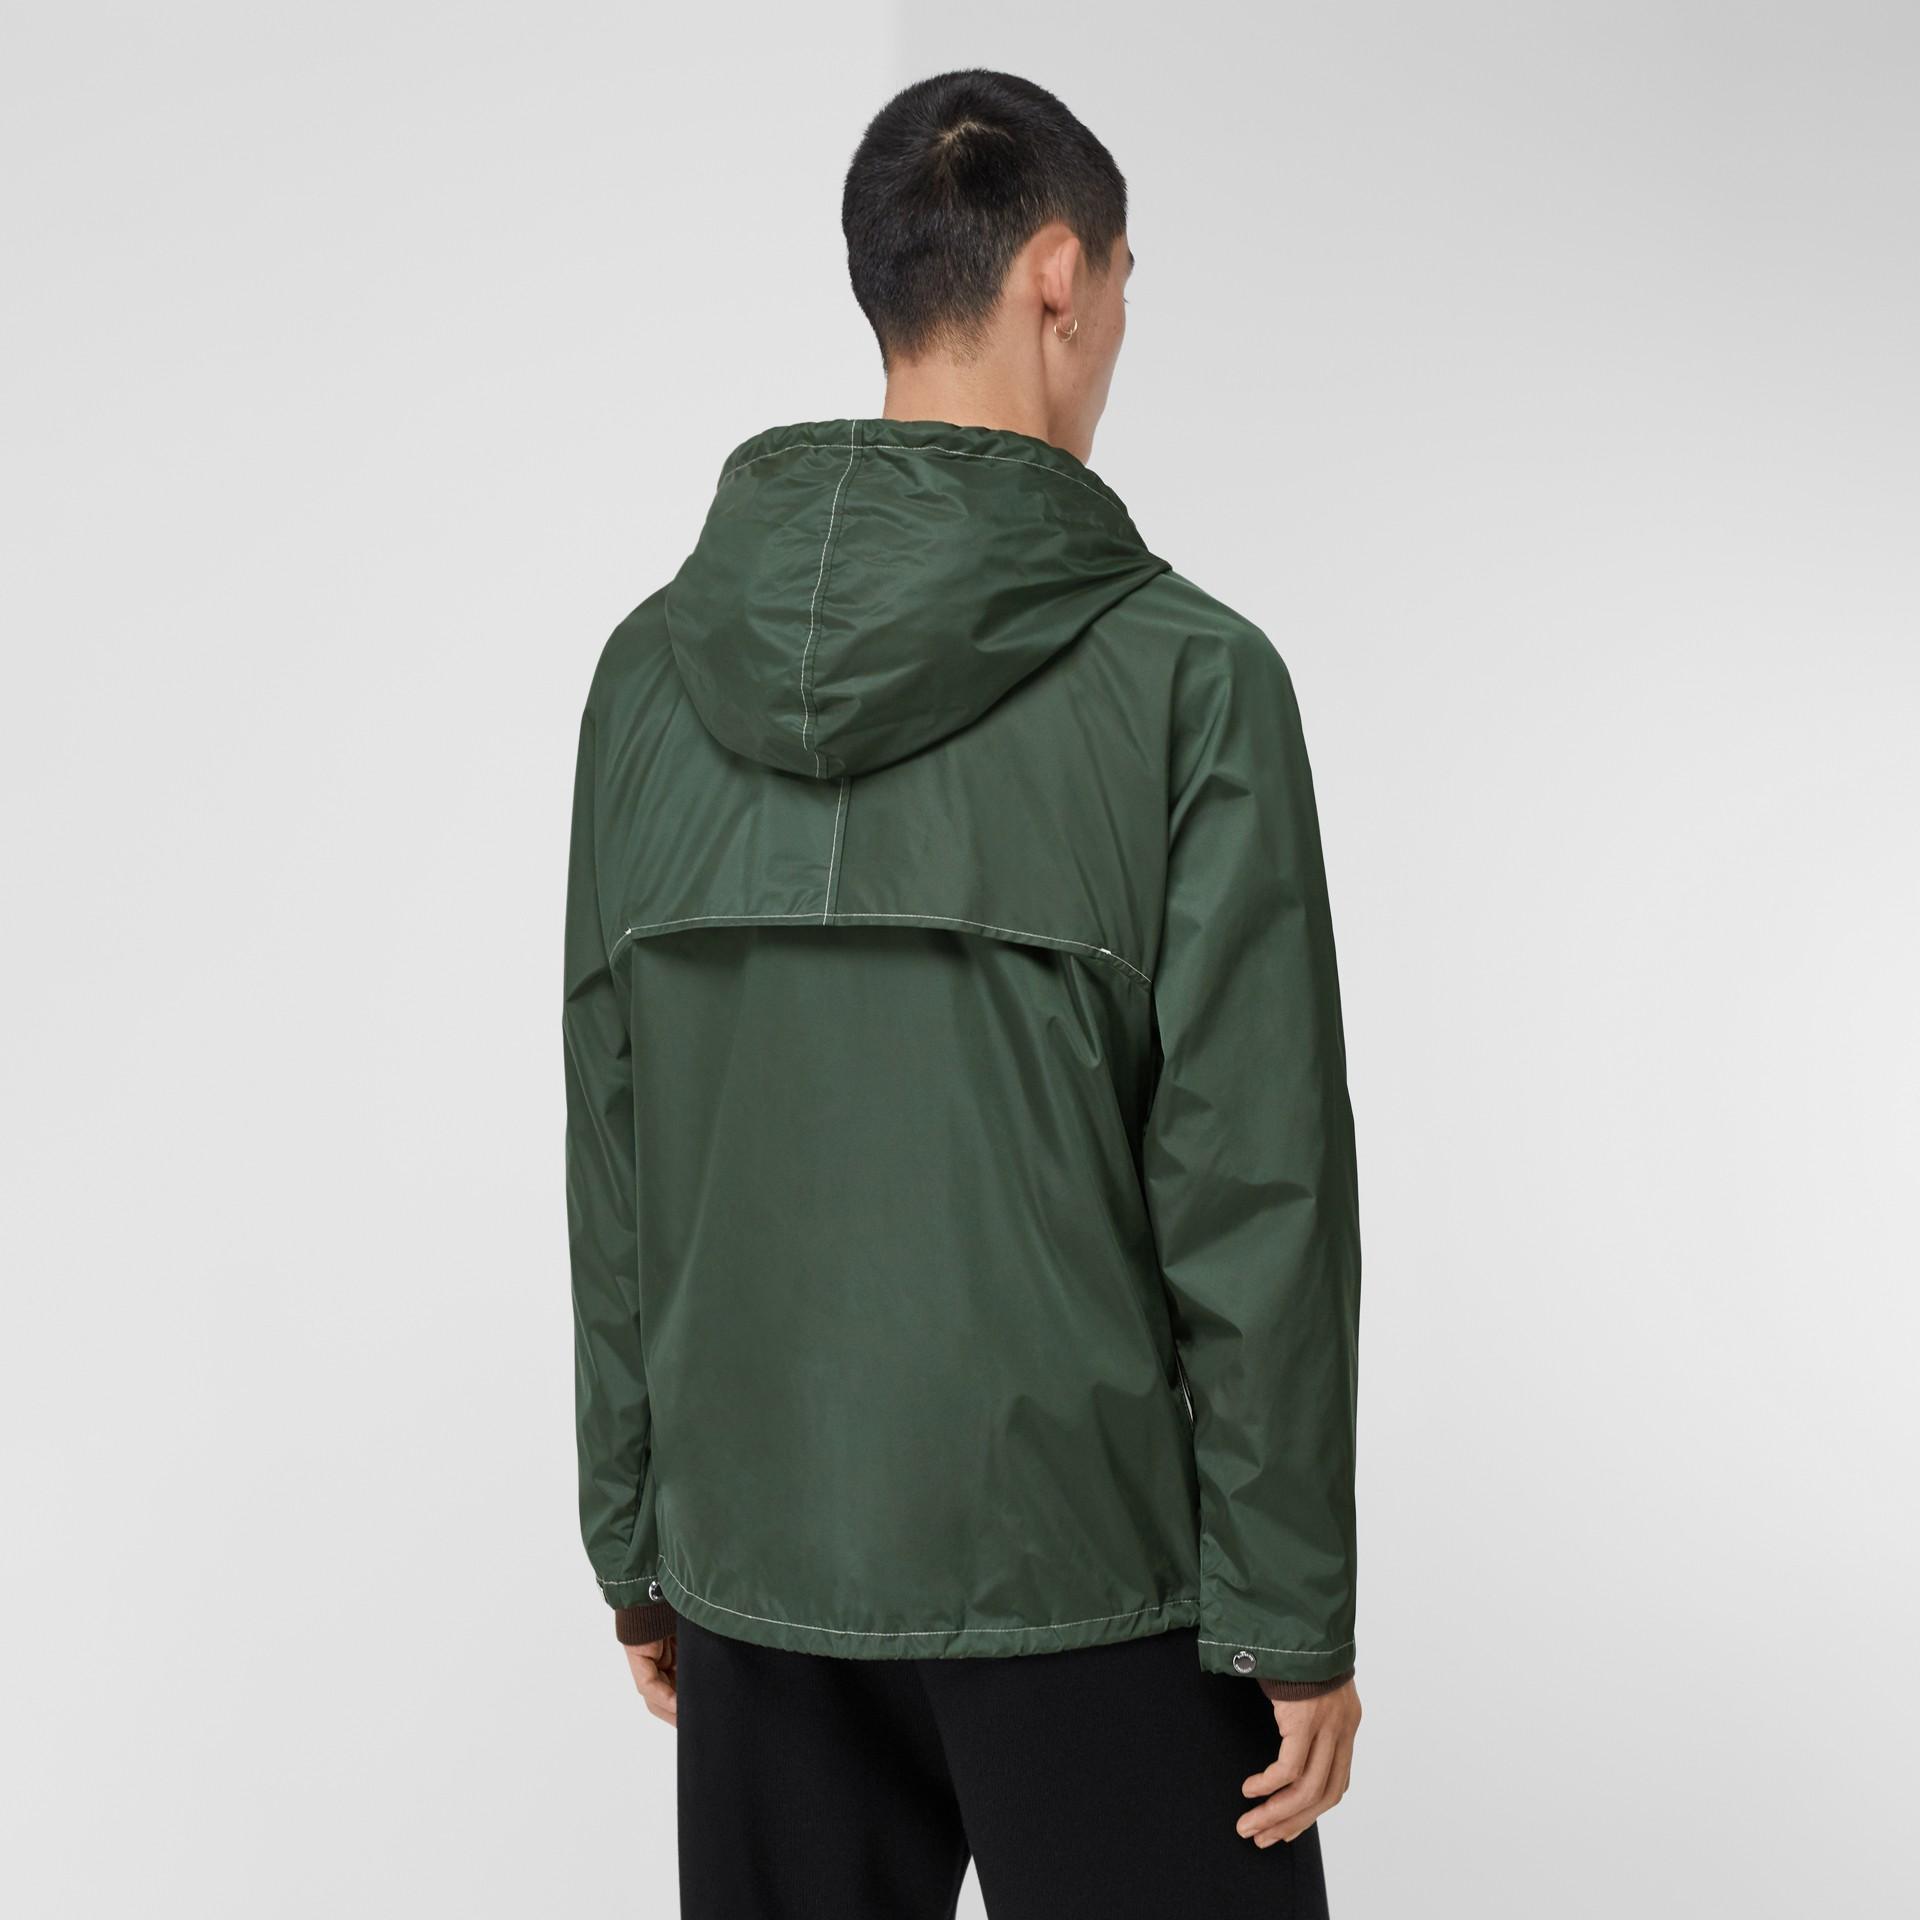 Logo Graphic Packaway Lightweight Hooded Jacket in Dark Pine Green - Men | Burberry Canada - gallery image 2